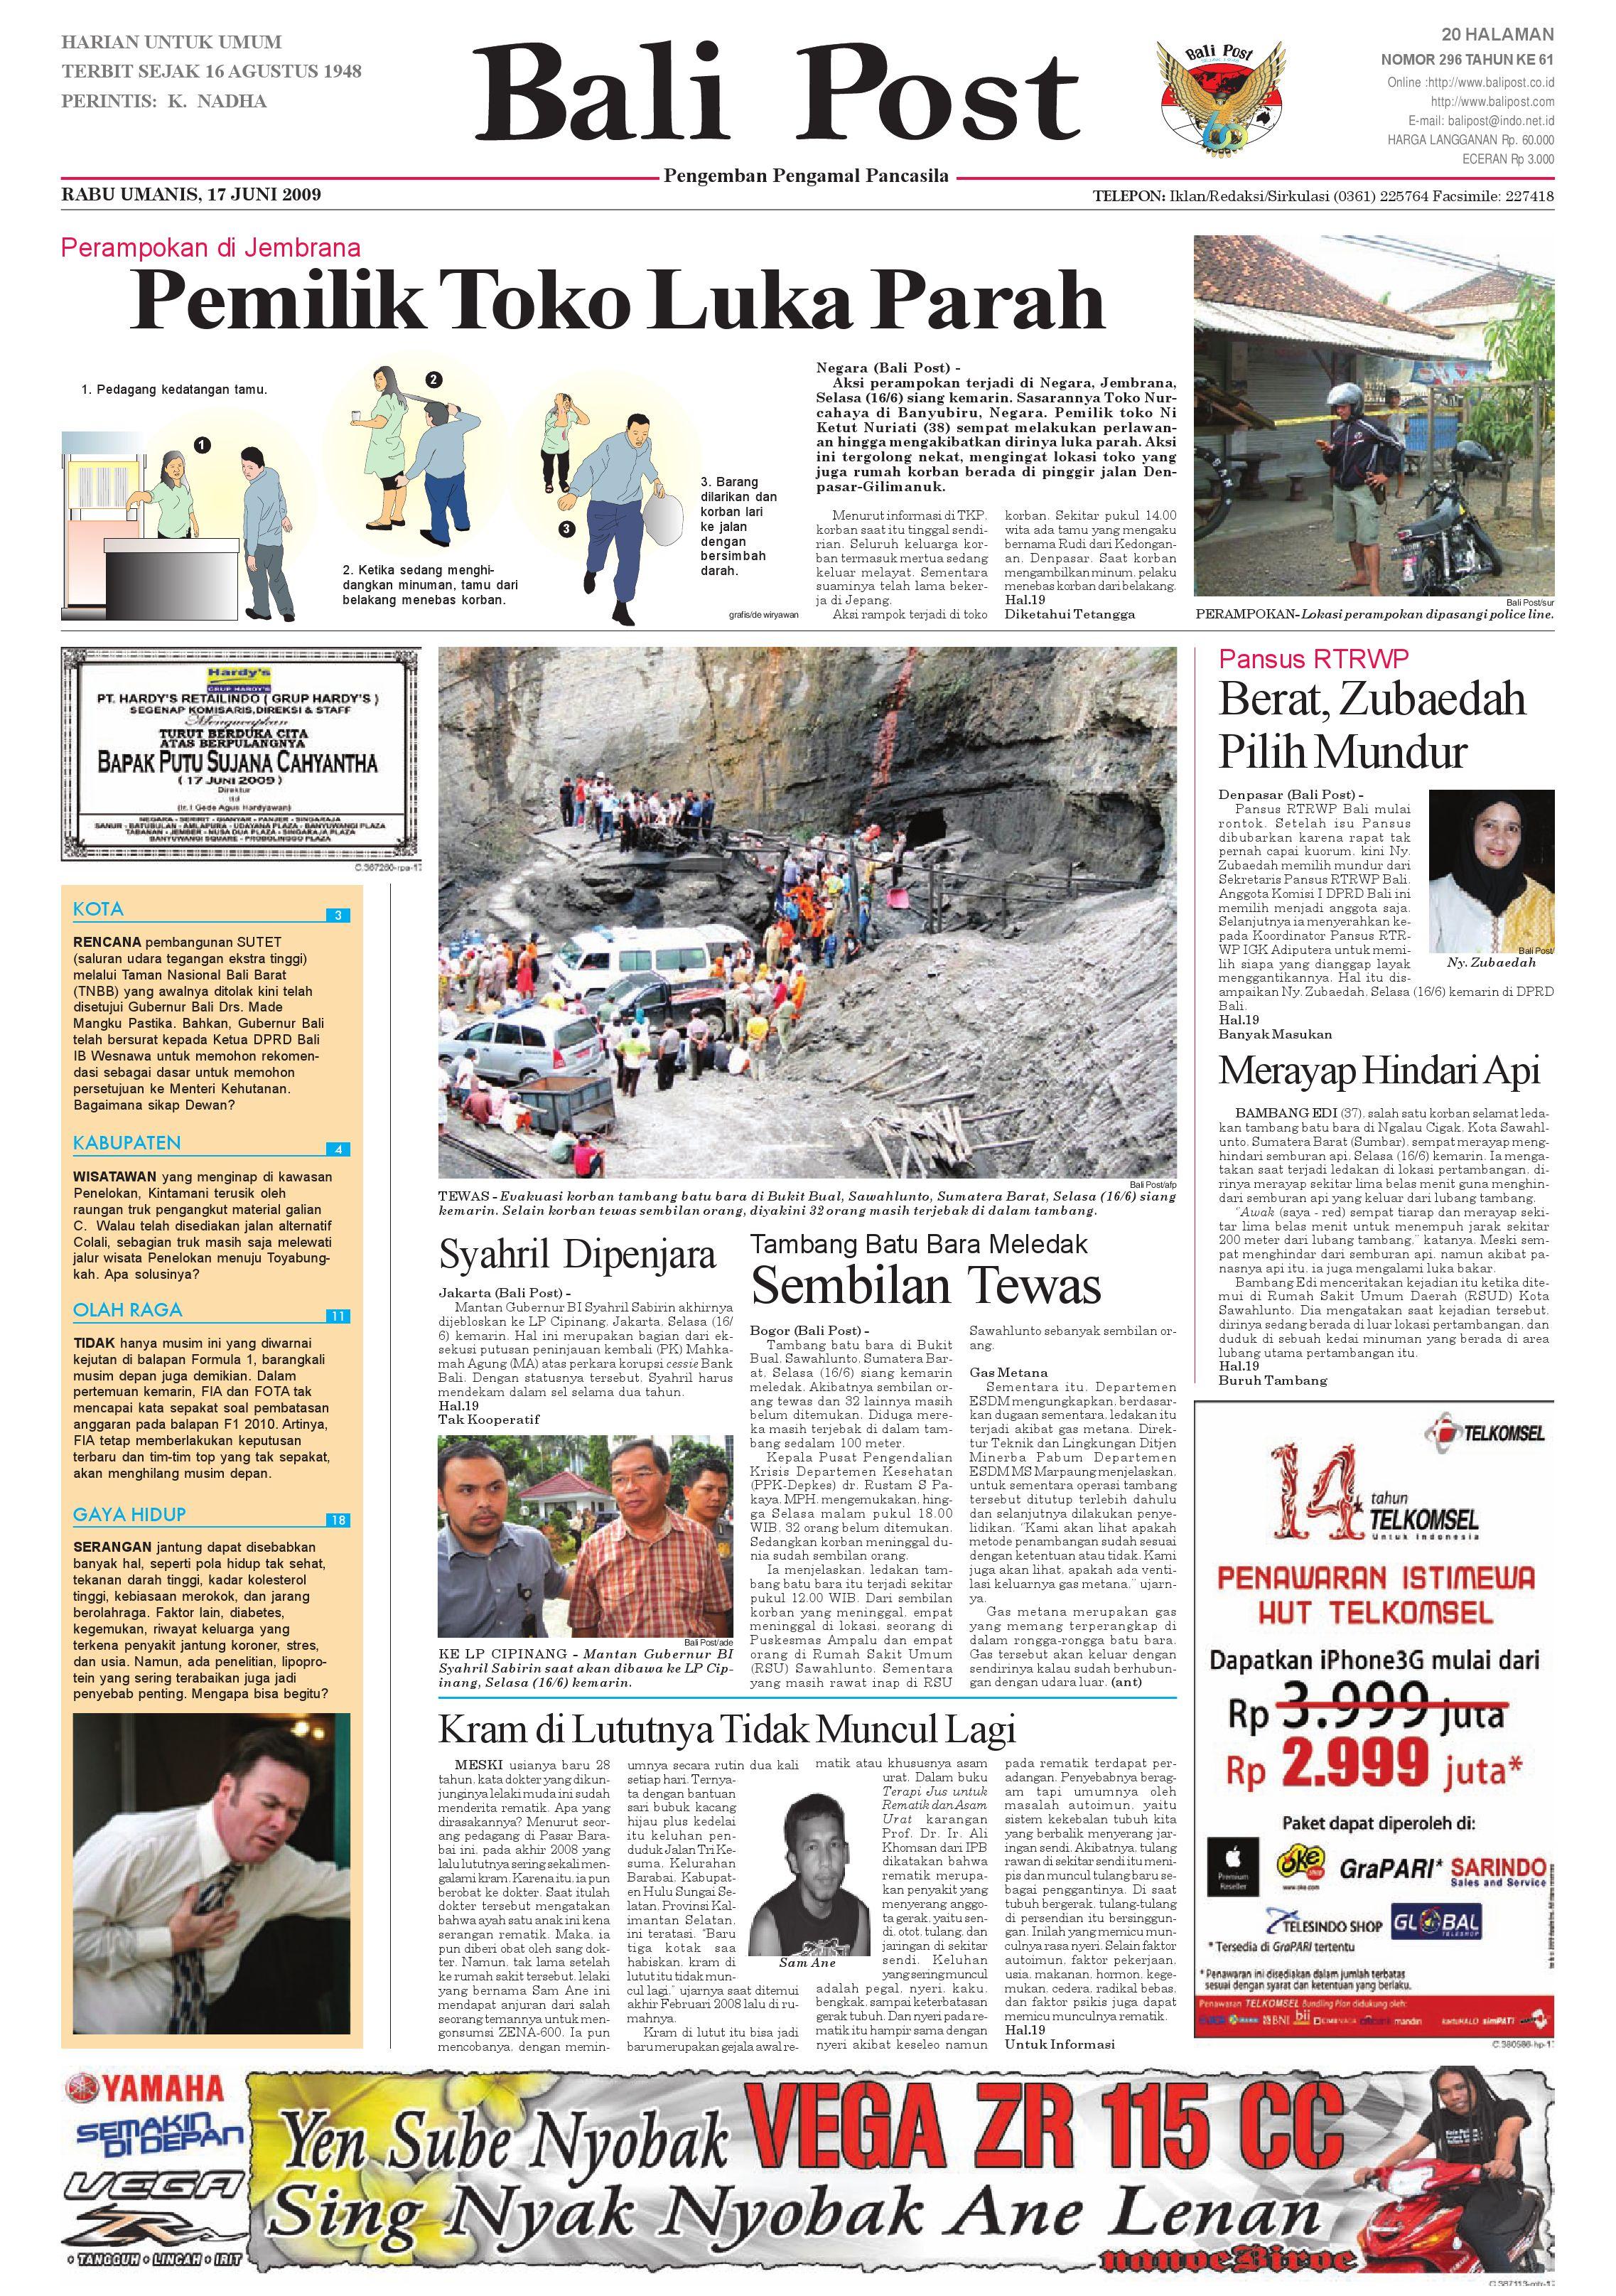 Bali Post Rabu 17 Juni 2009 By E Paper Kmb Issuu Voucher 300 Plus Tiara Gatzu Monang Maning Toko Soputan